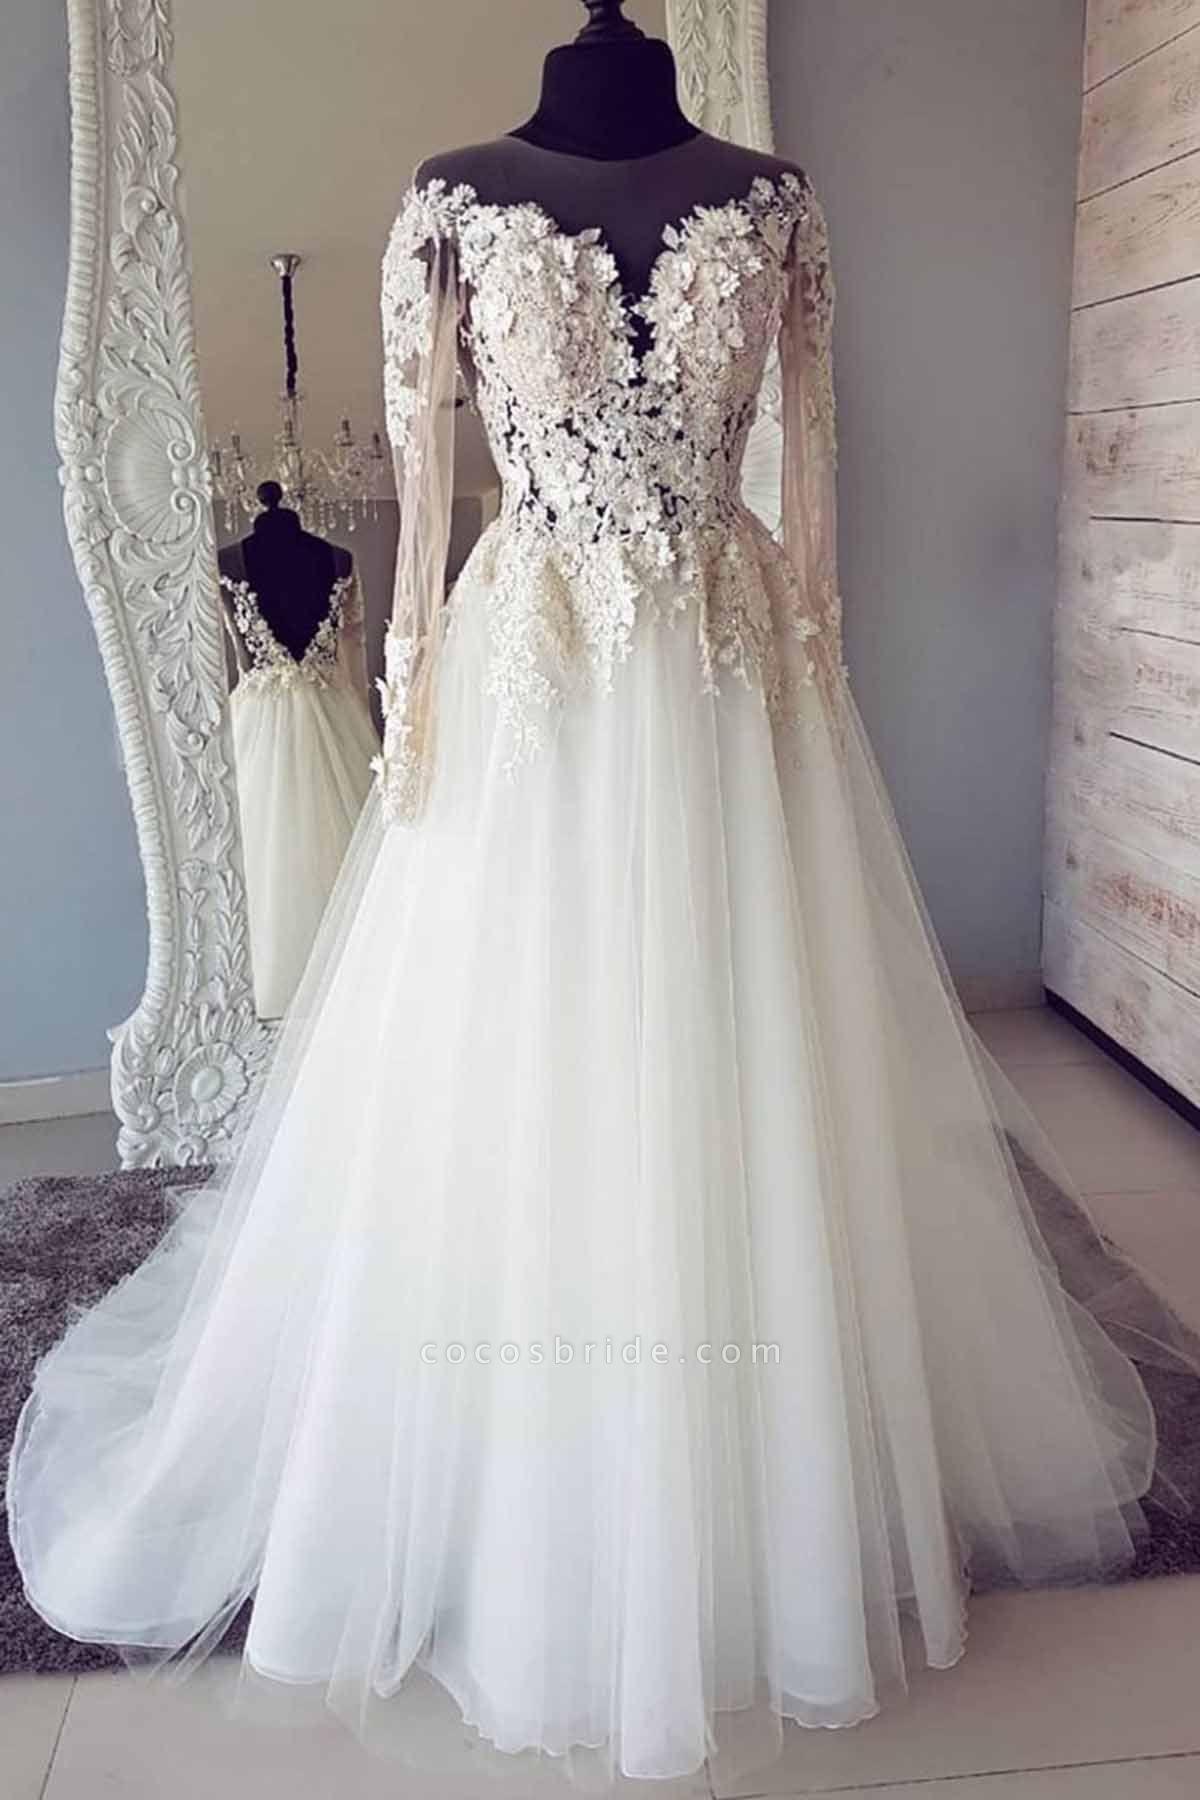 White Tulle Lace Long Round Neck Customize Wedding Dress